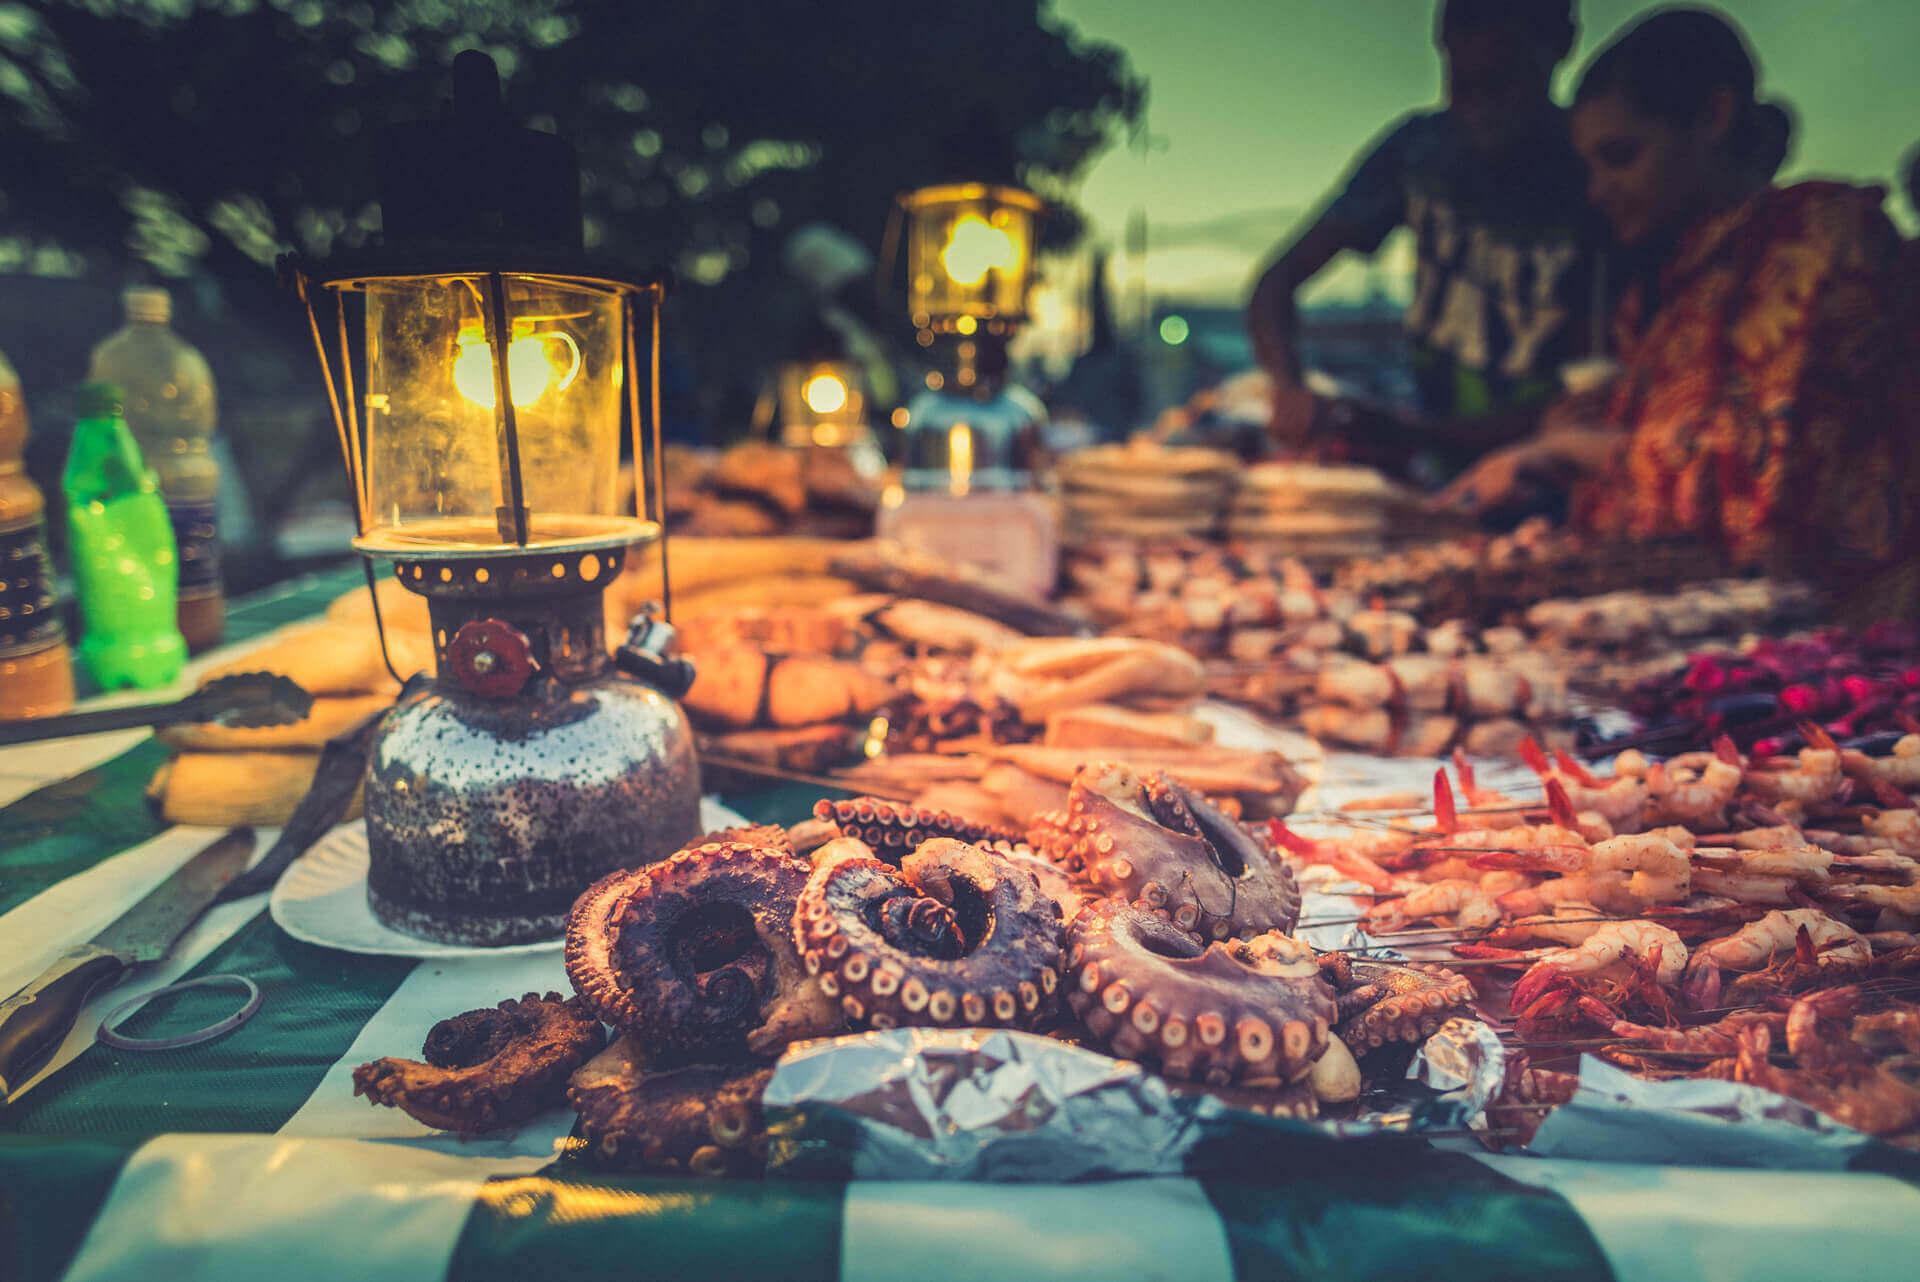 zanzibar-stonetown-market-harbour-street-food-octopus.jpg